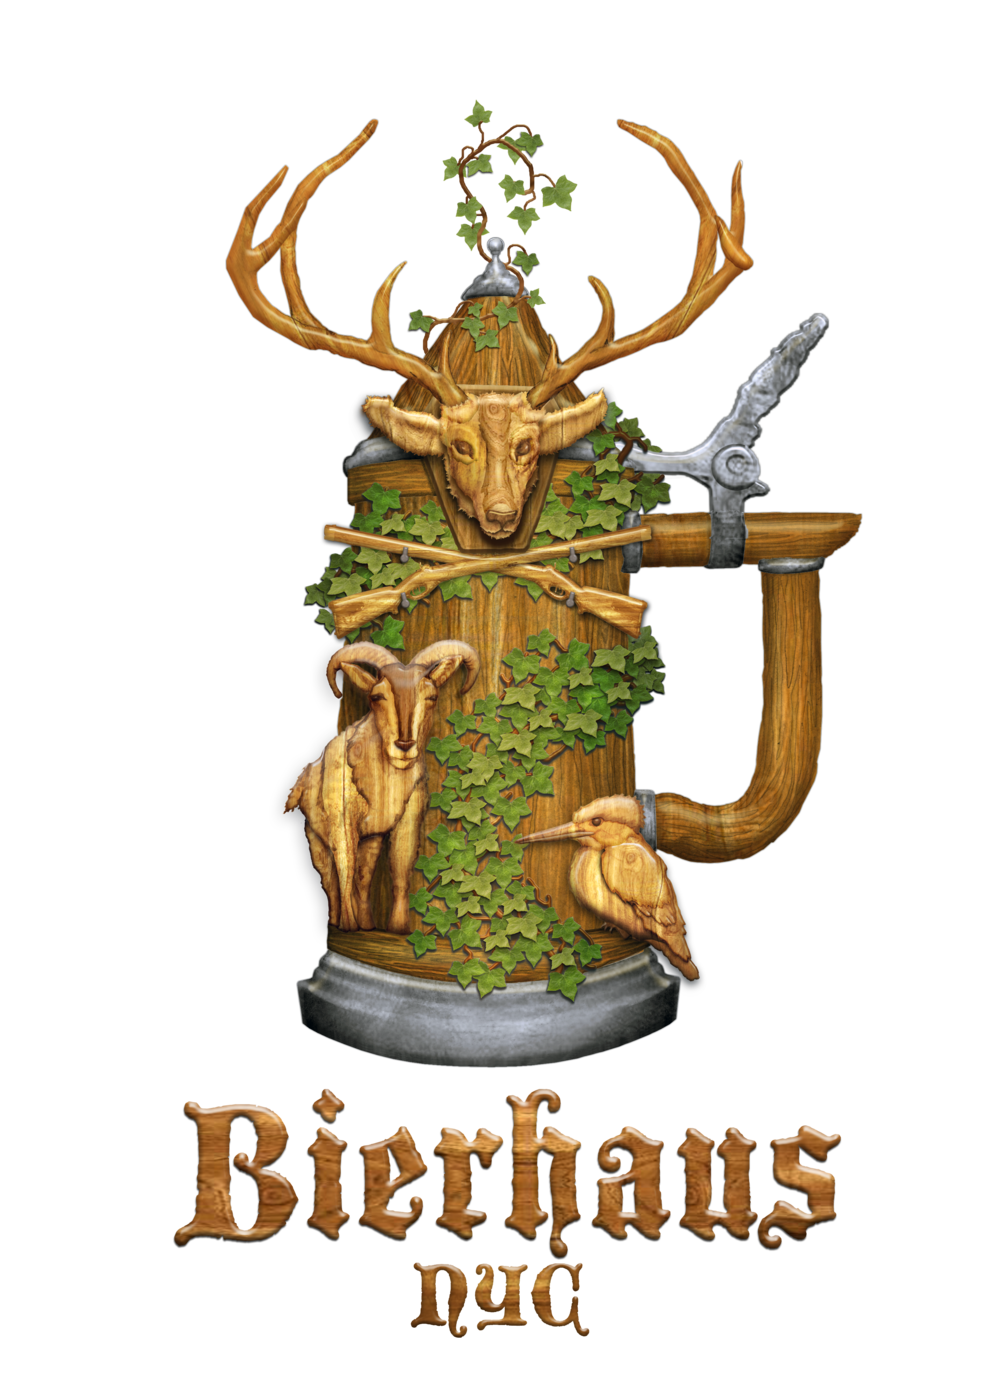 German clipart bavarian pretzel. Bierhaus nyc restaurant biergarten